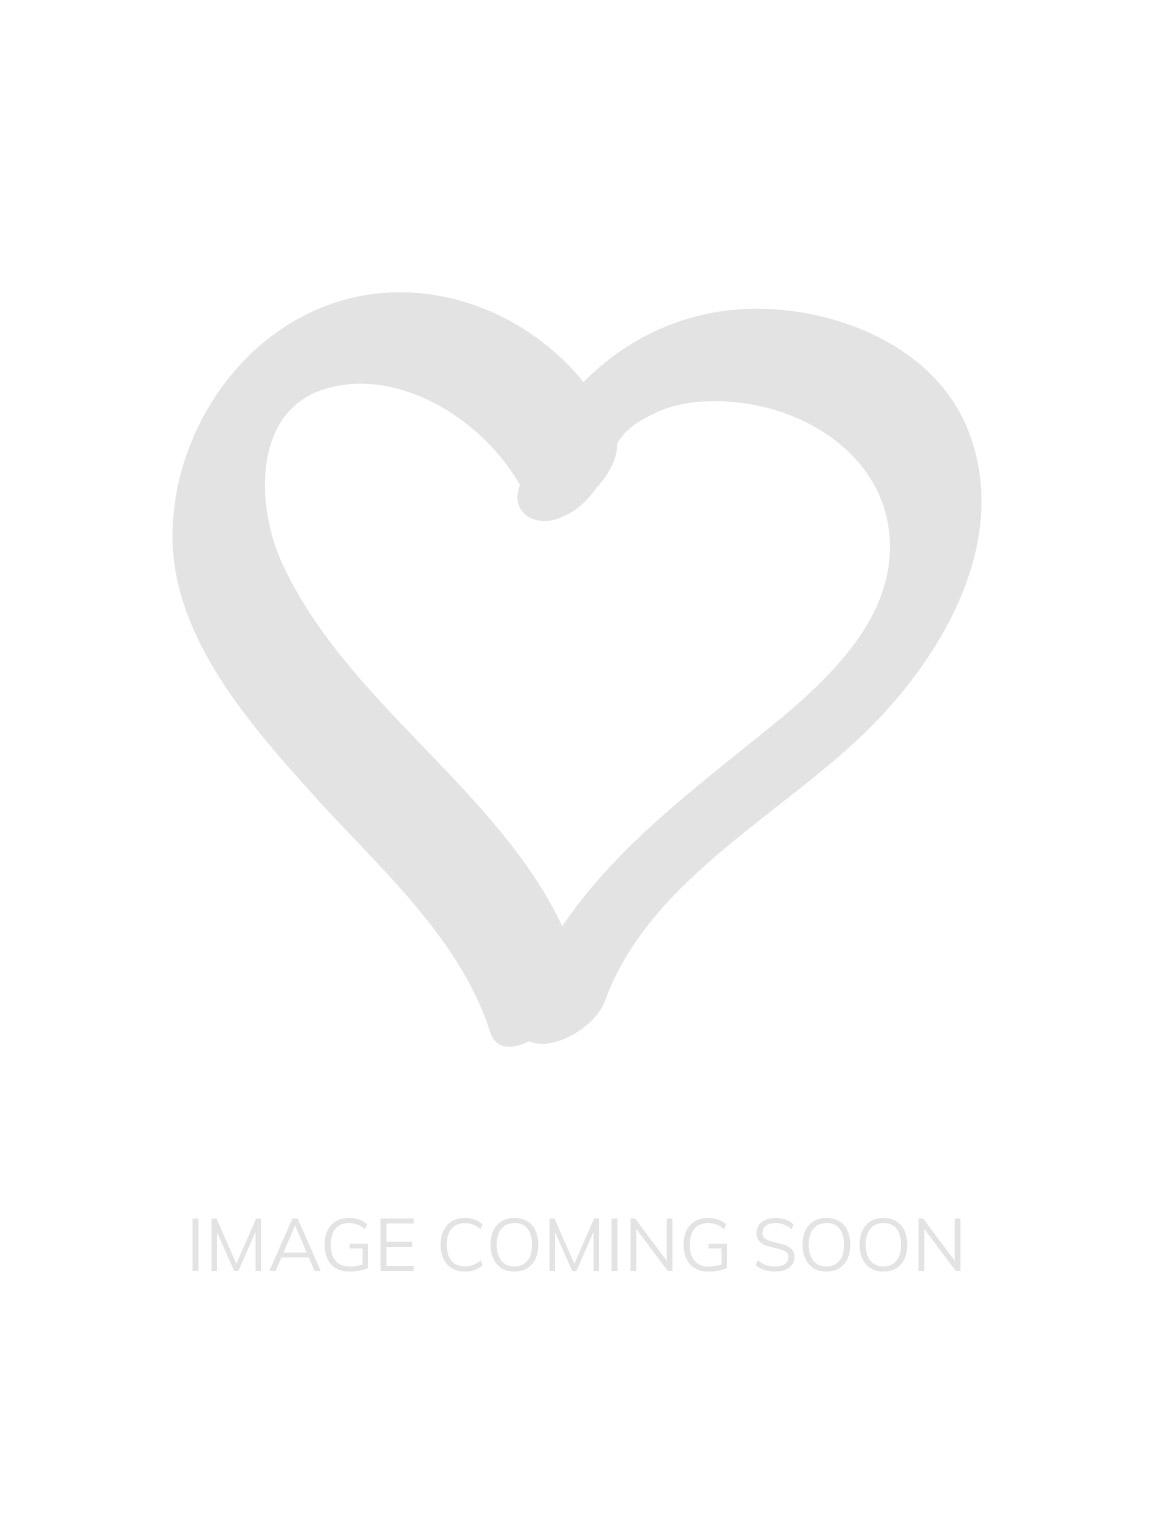 947fc1e01d212e Body Make-up Soft Touch Plunge Bra - Stormy Grey